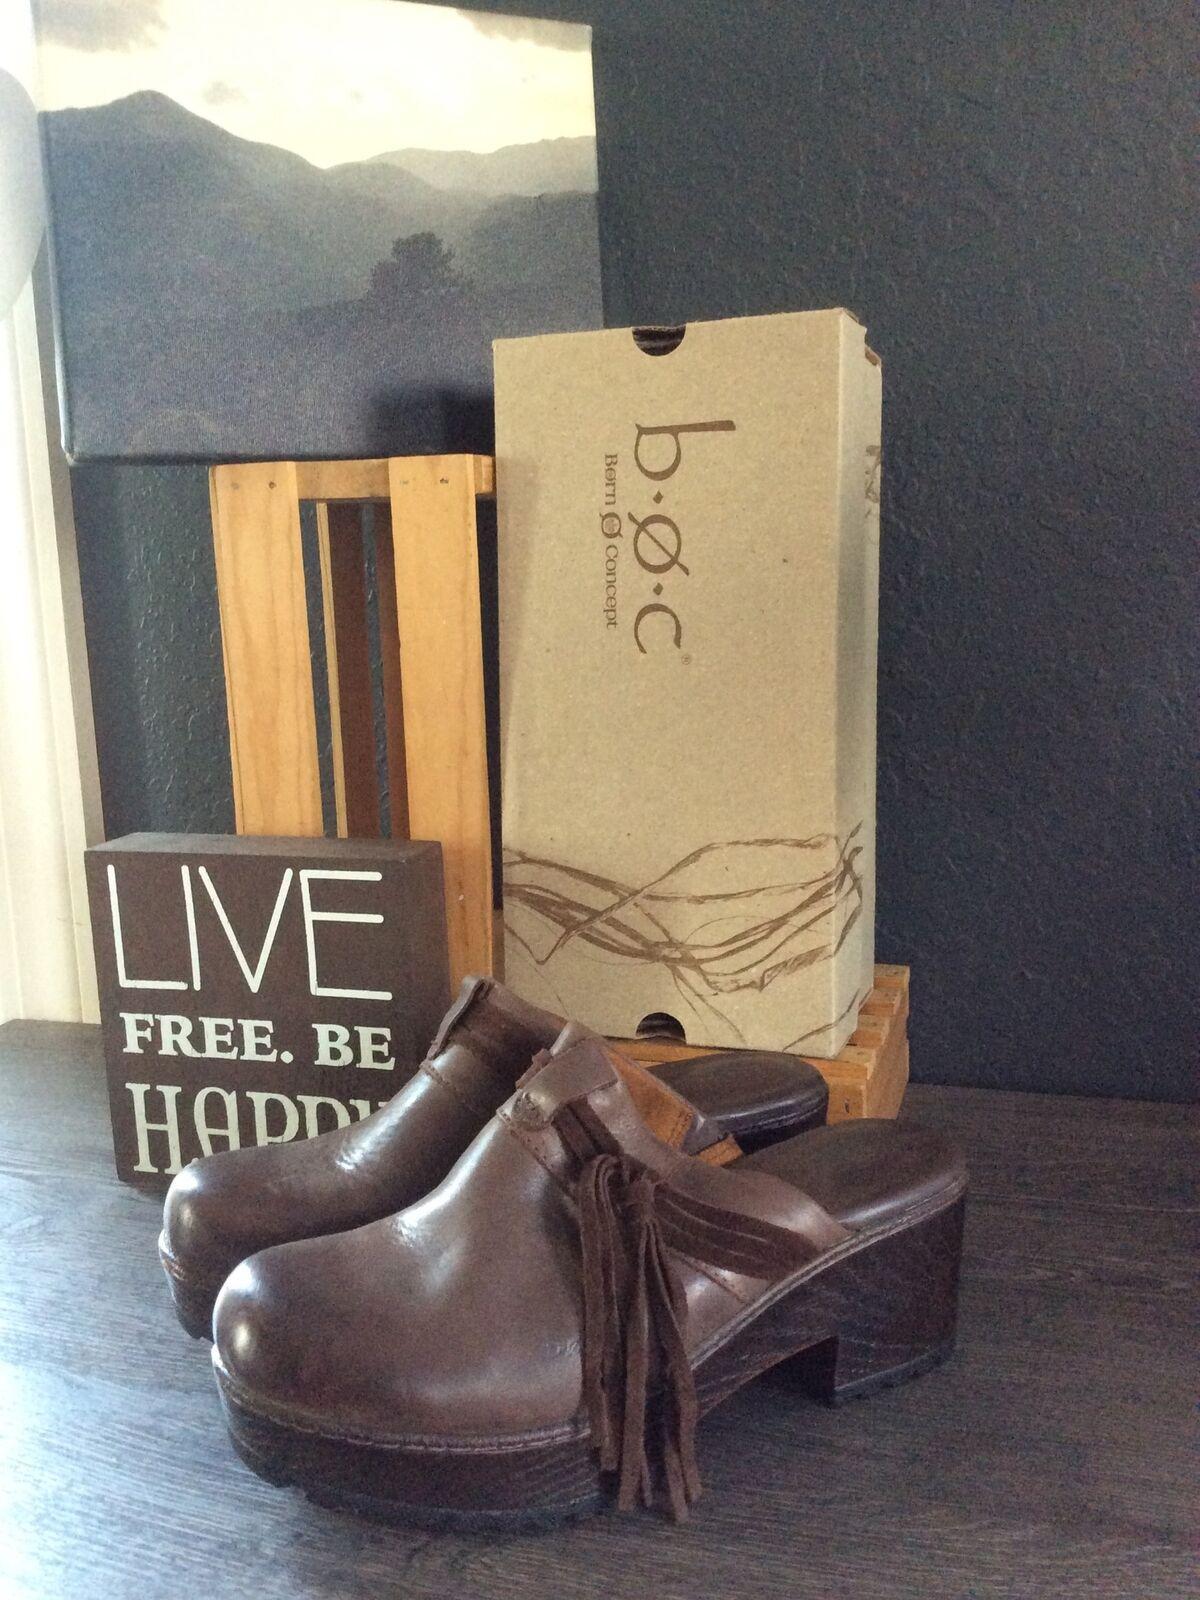 BOC Women's Brown Soft Leather Tasseled Fringe Platform Clogs 8M PreOwned EUC